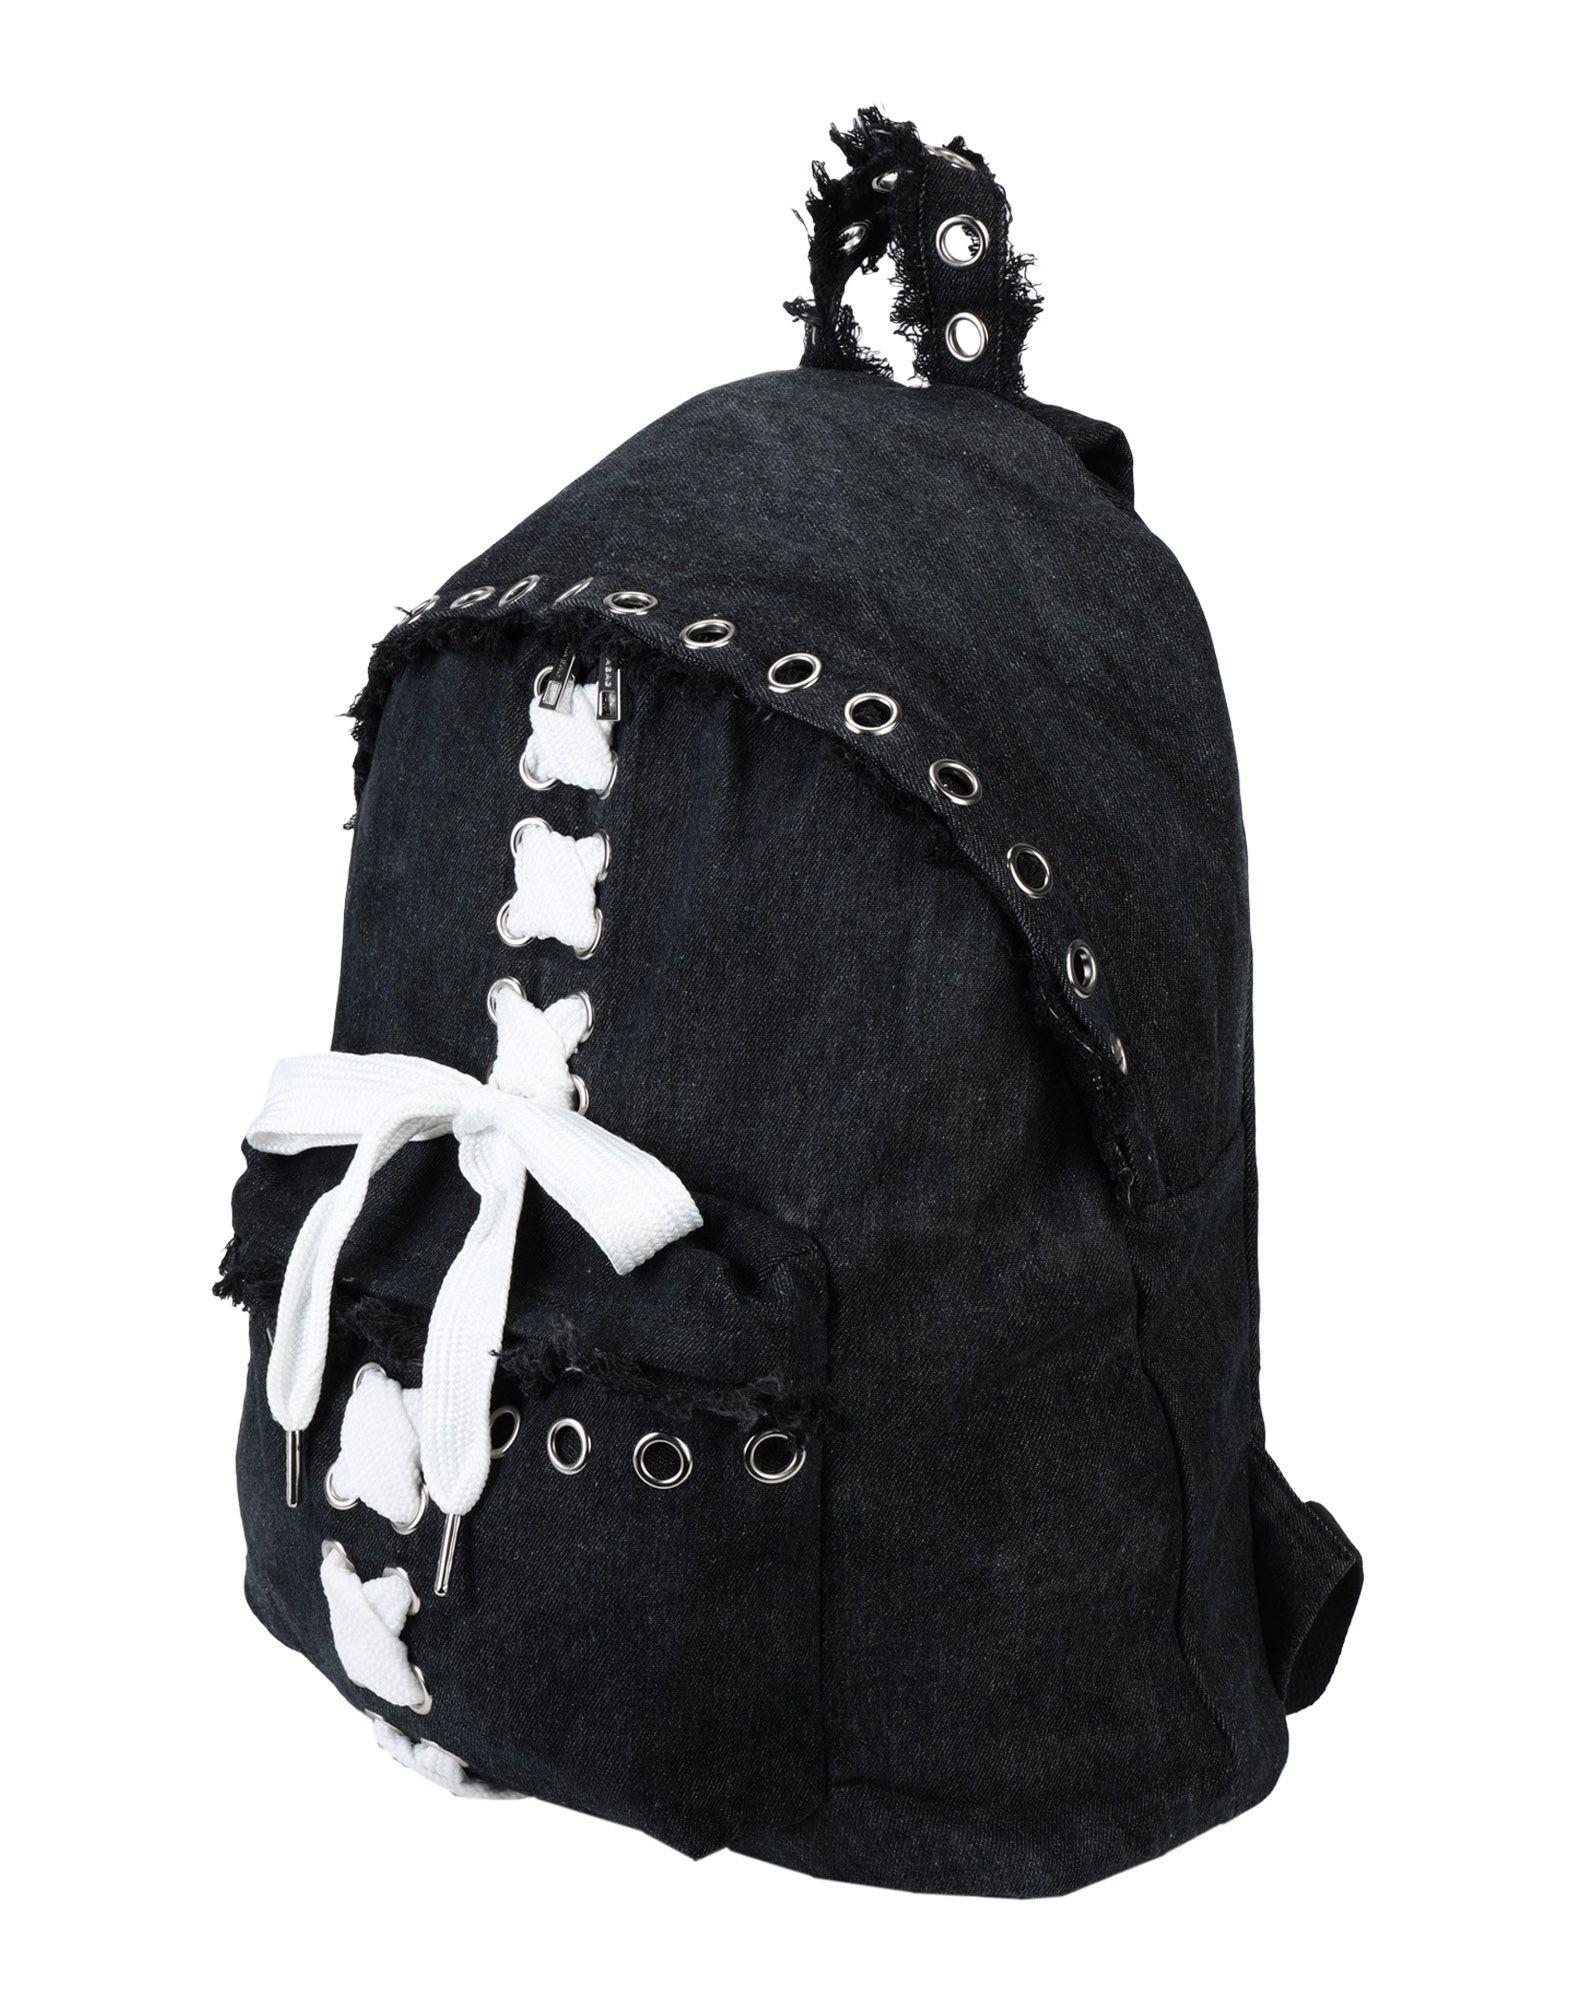 Фото - MIA BAG Рюкзаки и сумки на пояс cow leather tote bag brand 2018 bolsa feminina new women handbag 100% genuine leather alligator shoulder bag free shipping